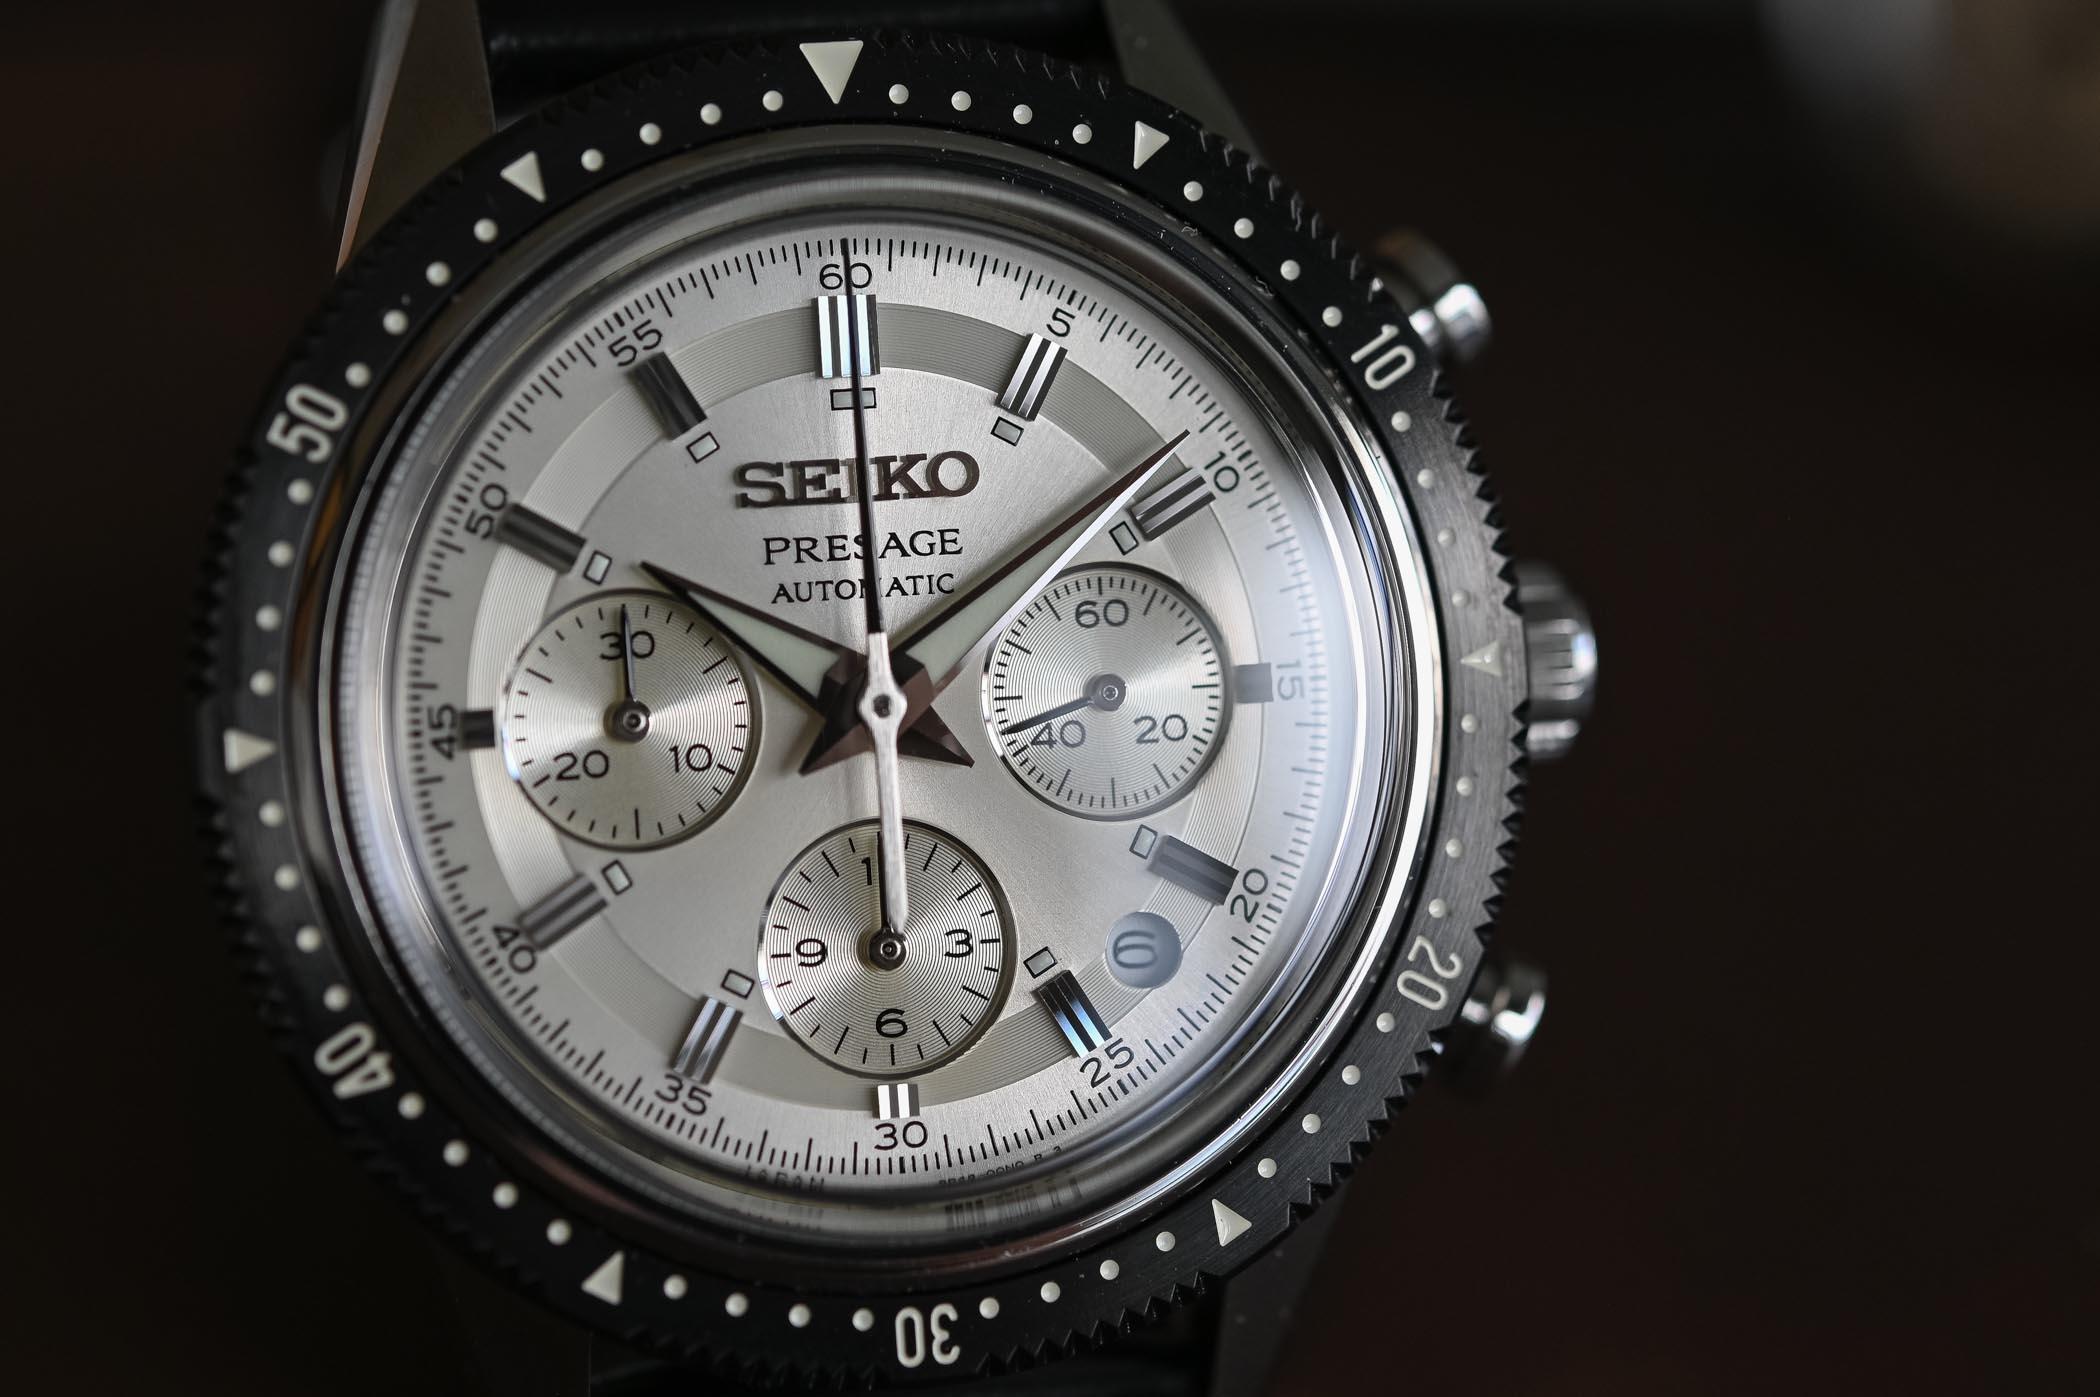 Seiko Presage Chronograph 55th Anniversary Limited Edition SRQ031